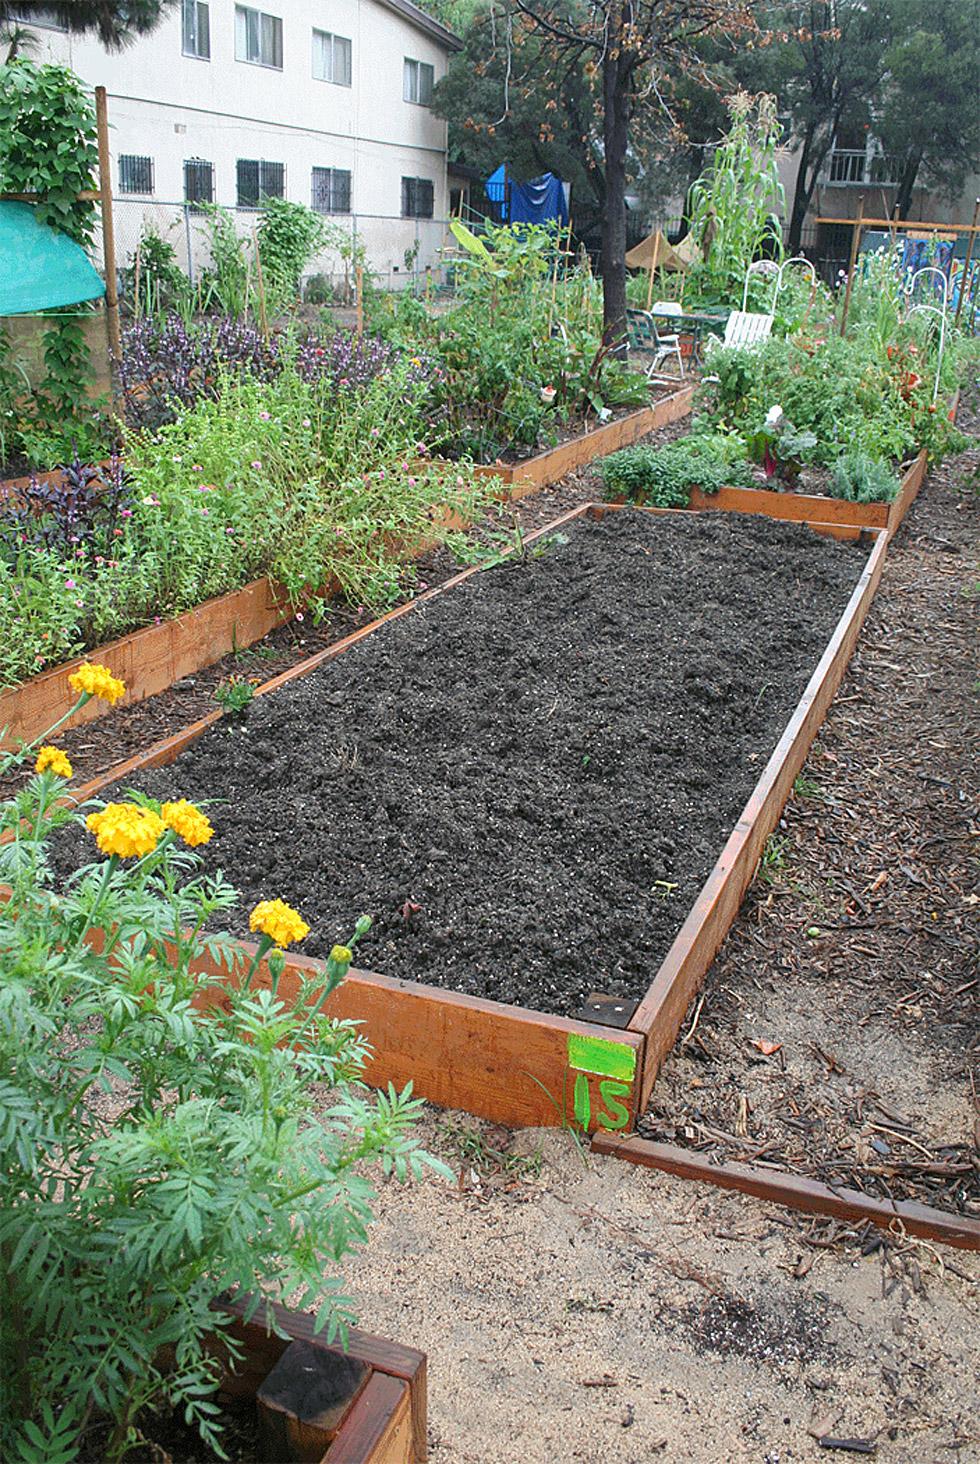 alferov-media-los-angeles-fountain-community-gardens-first-spring-season